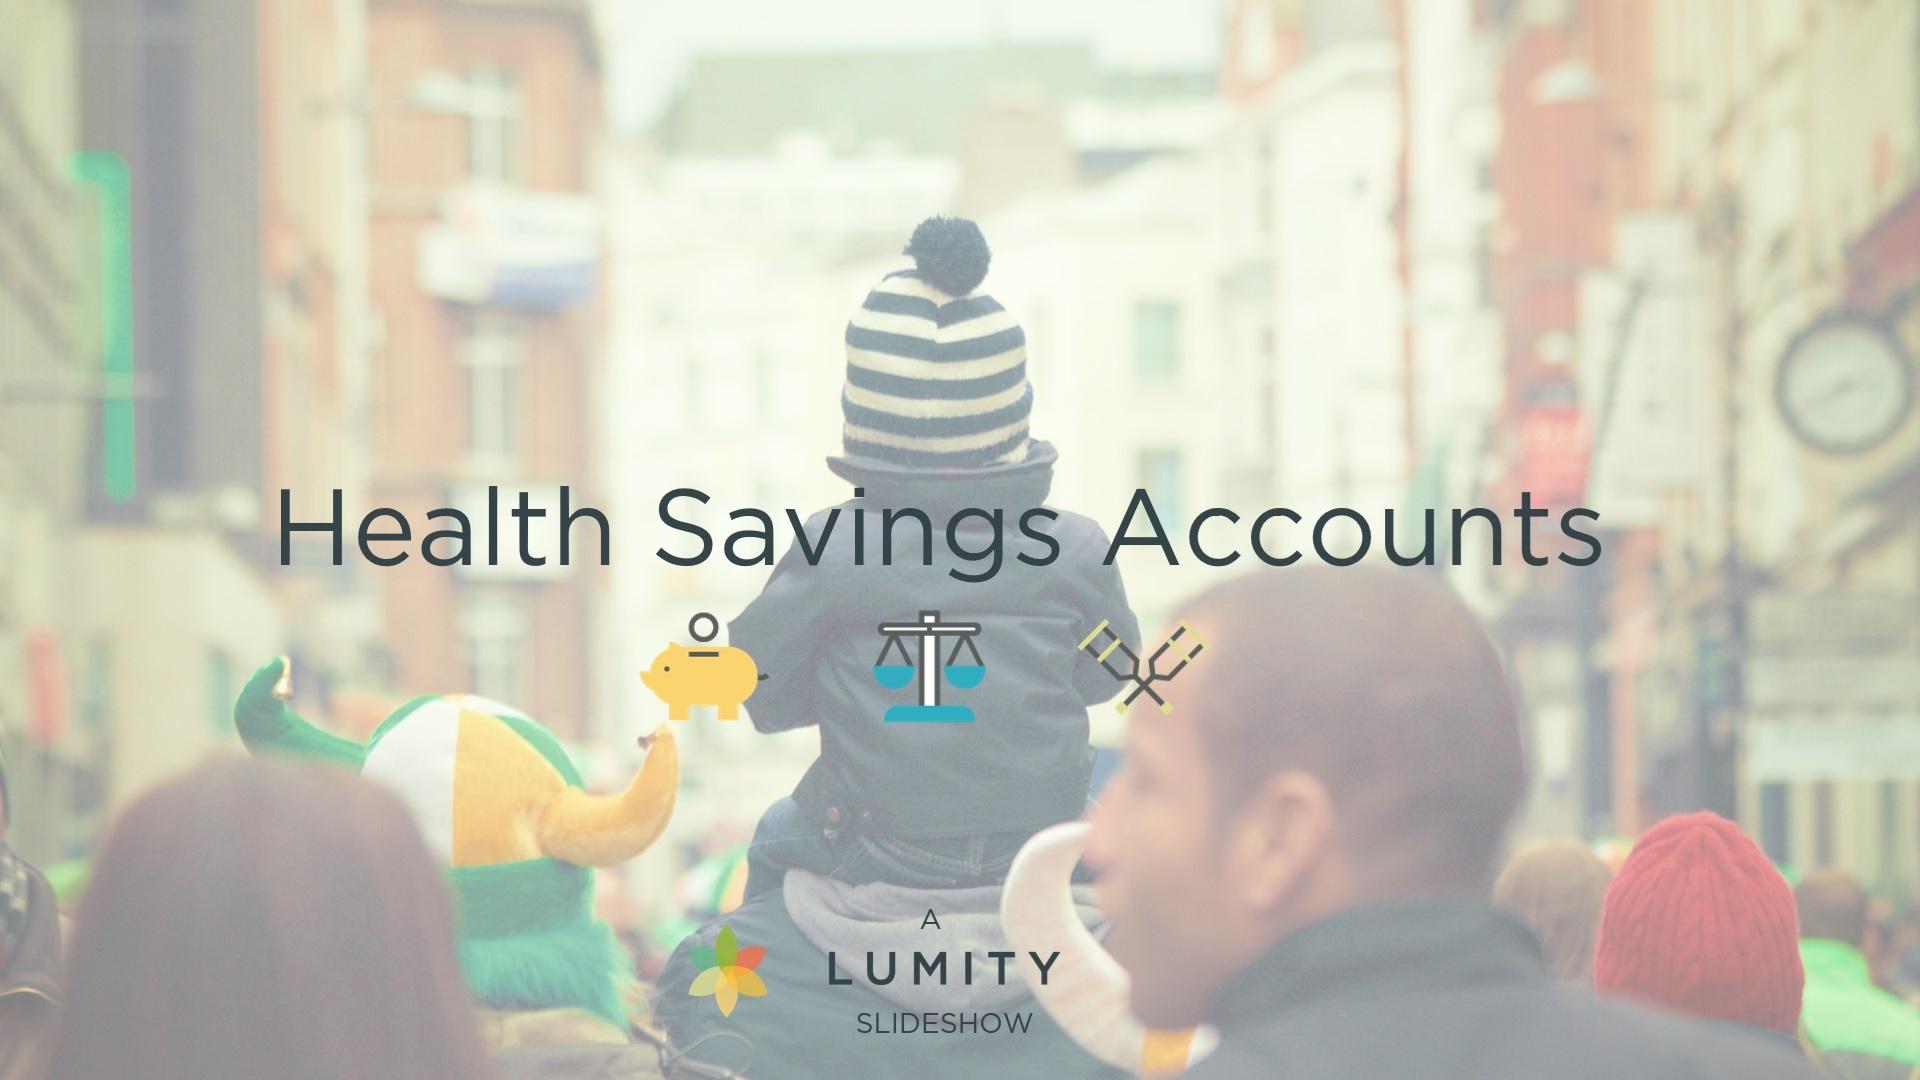 Health Savings Account 101 Slideshow